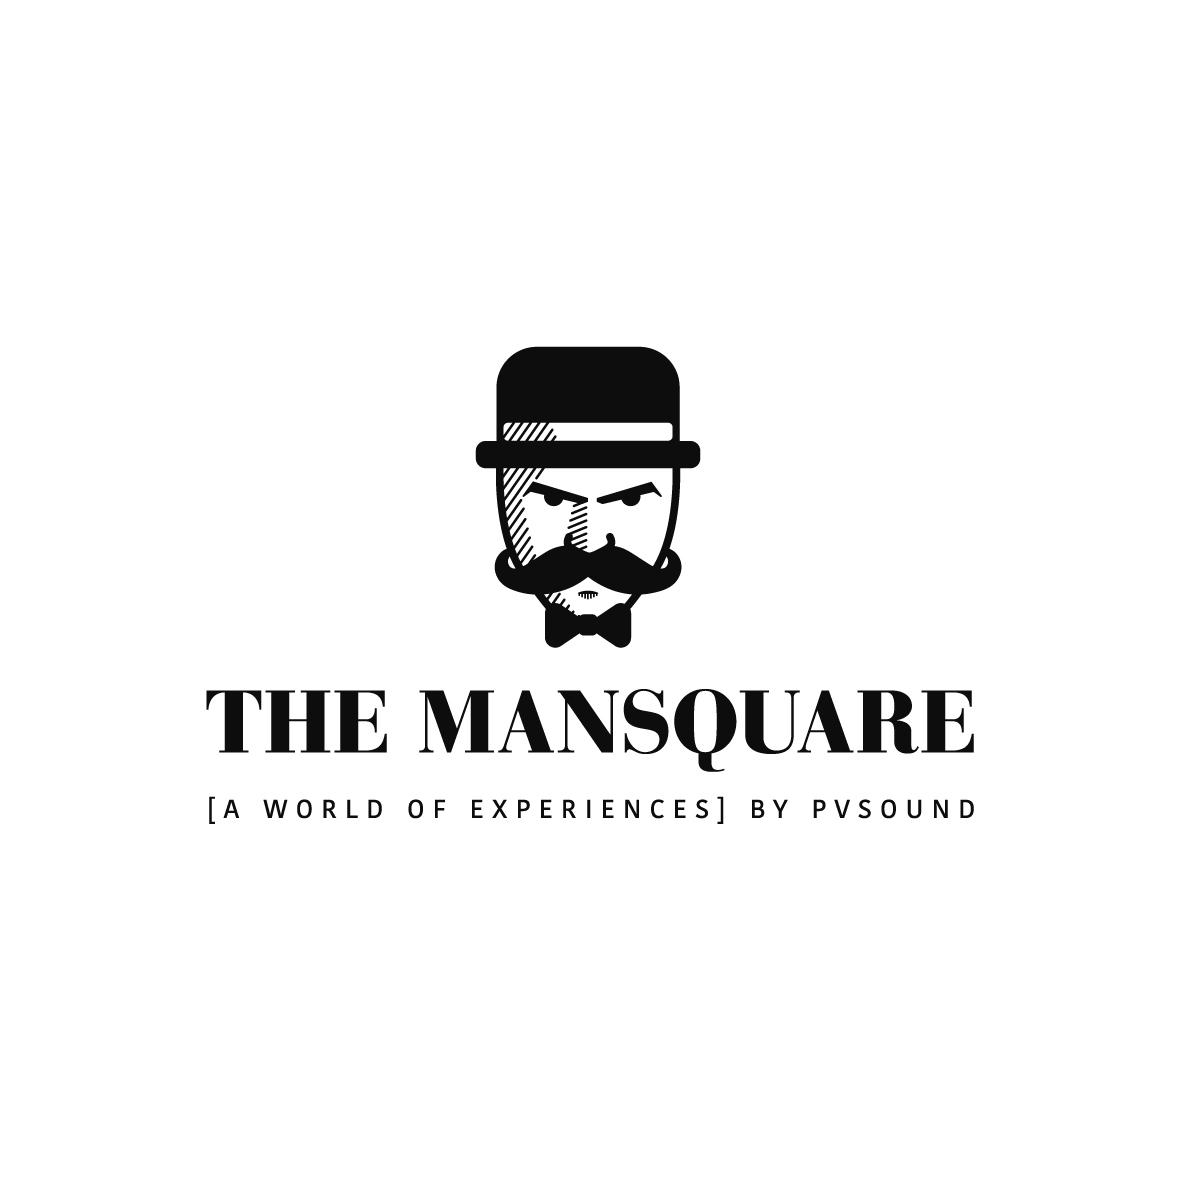 The Mansquare